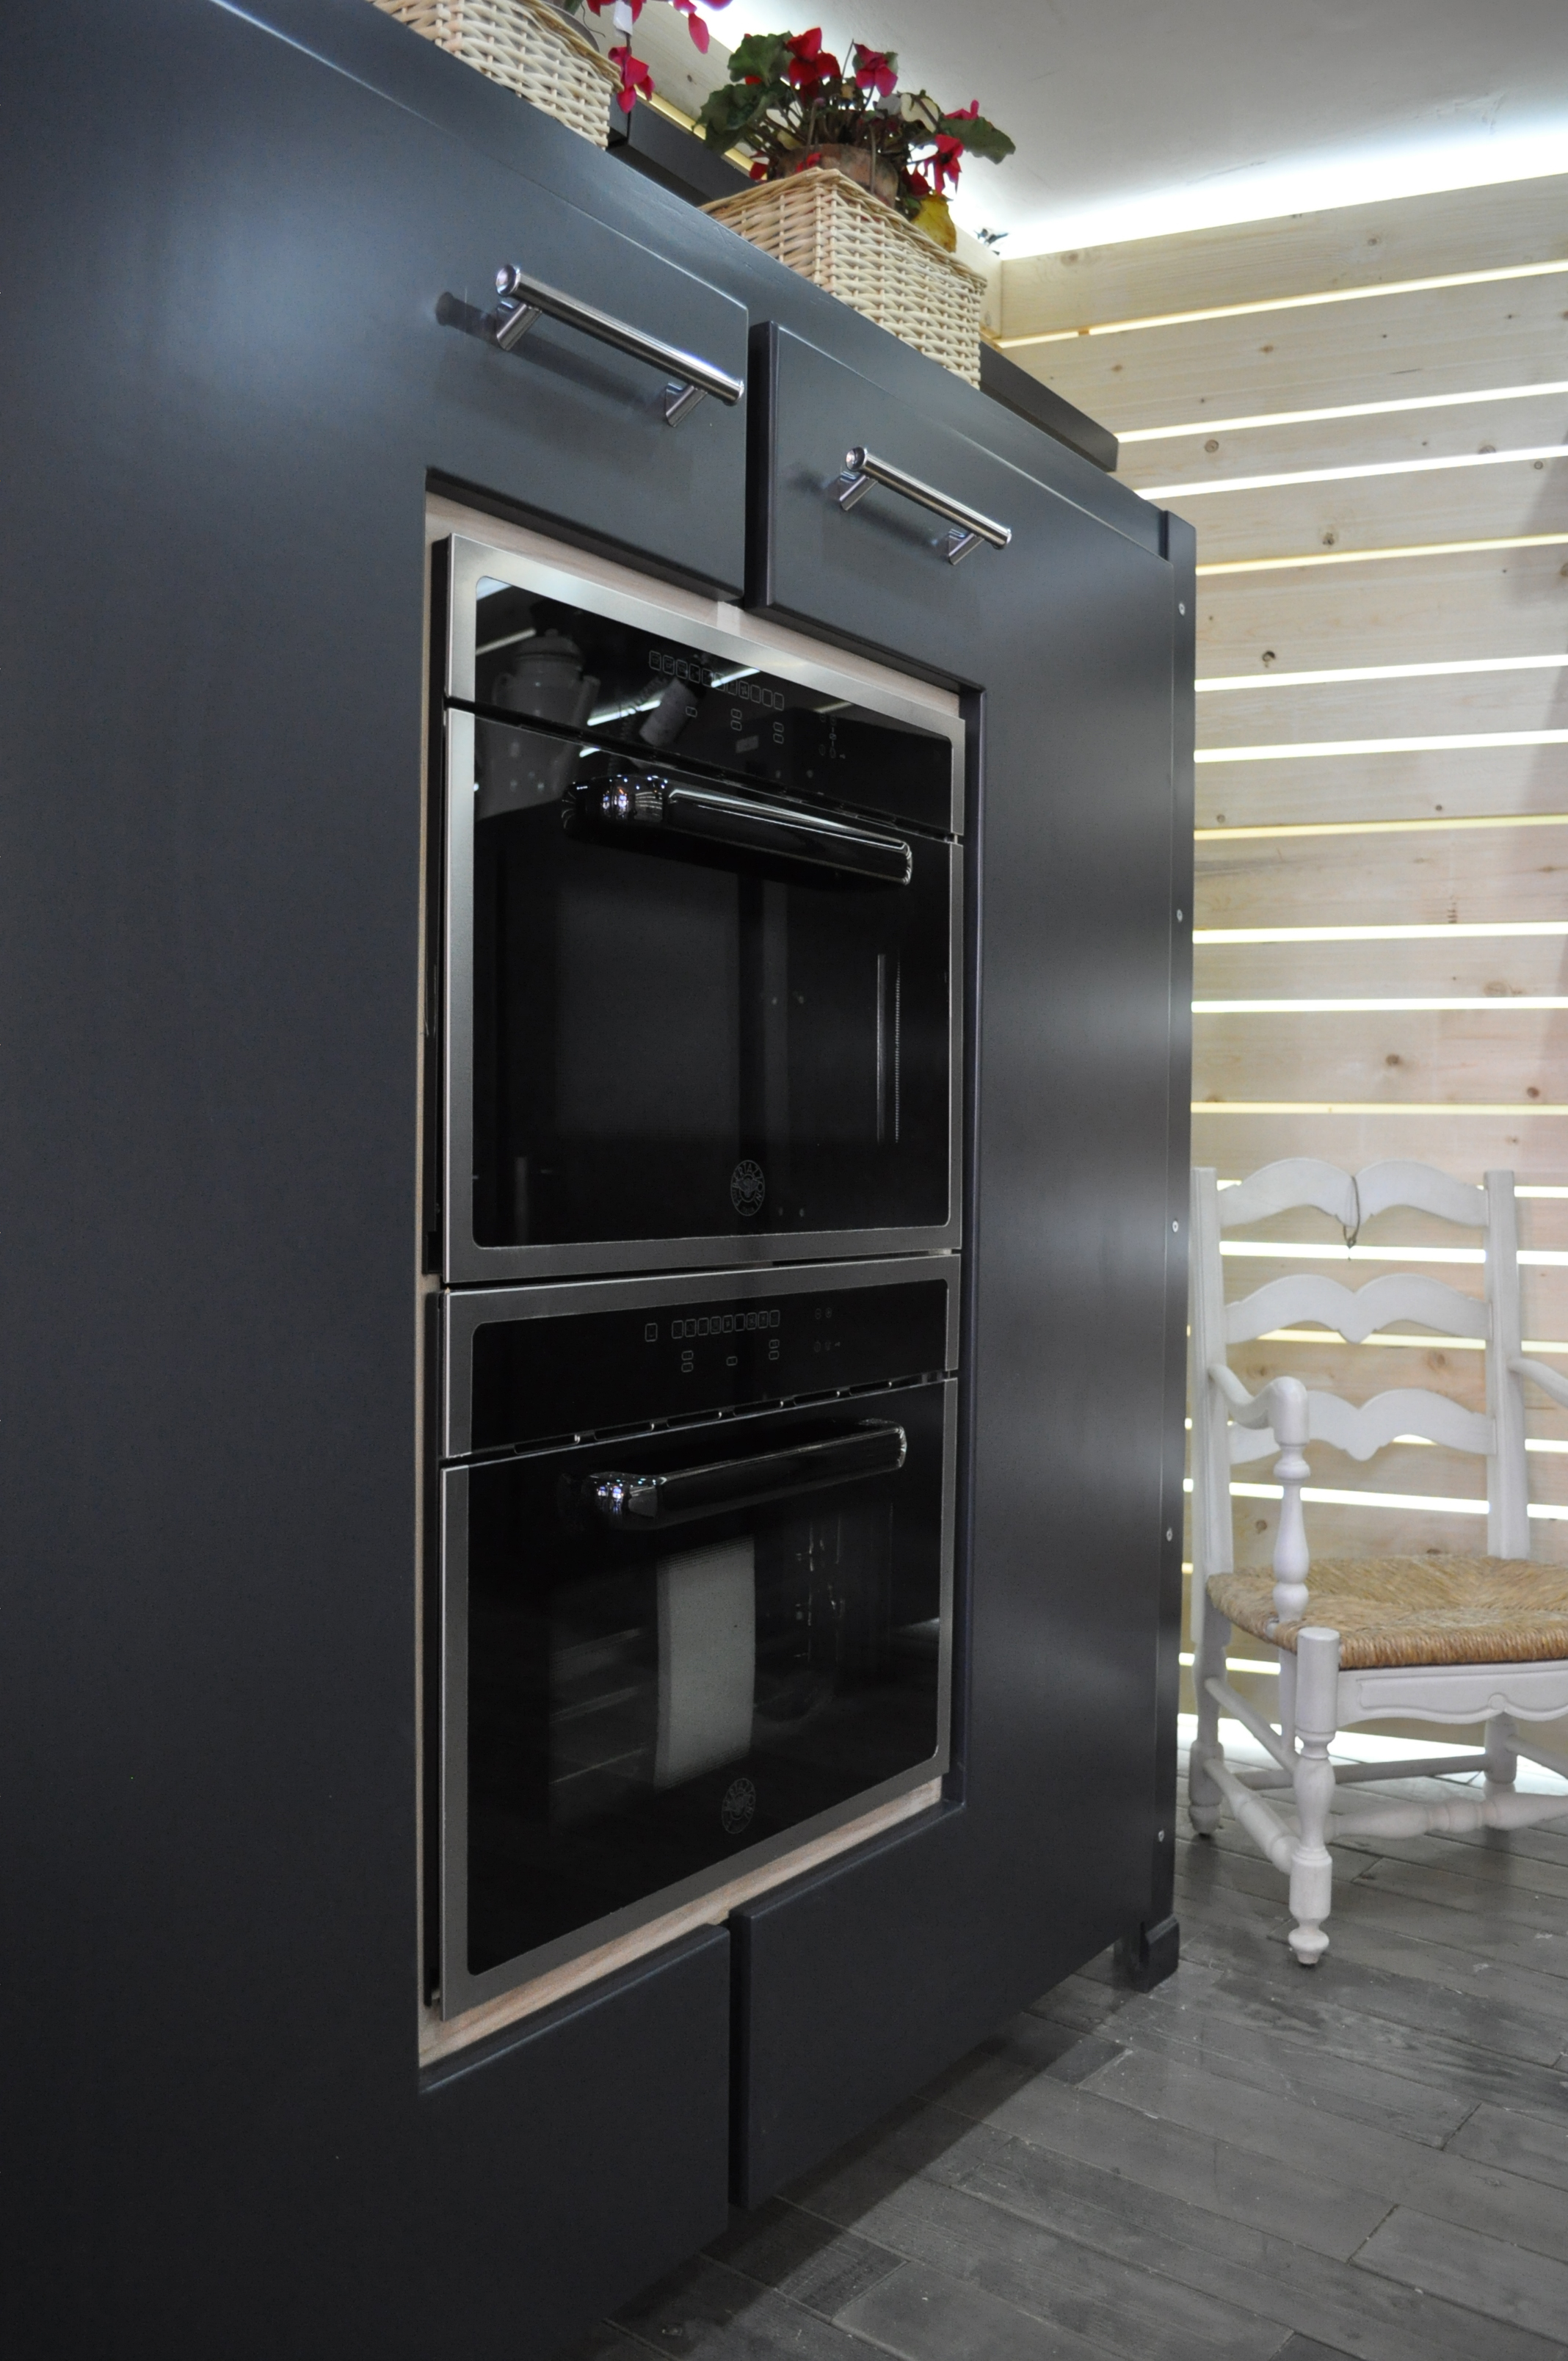 Cucina su misura Industrial-Falegnameria roma_3